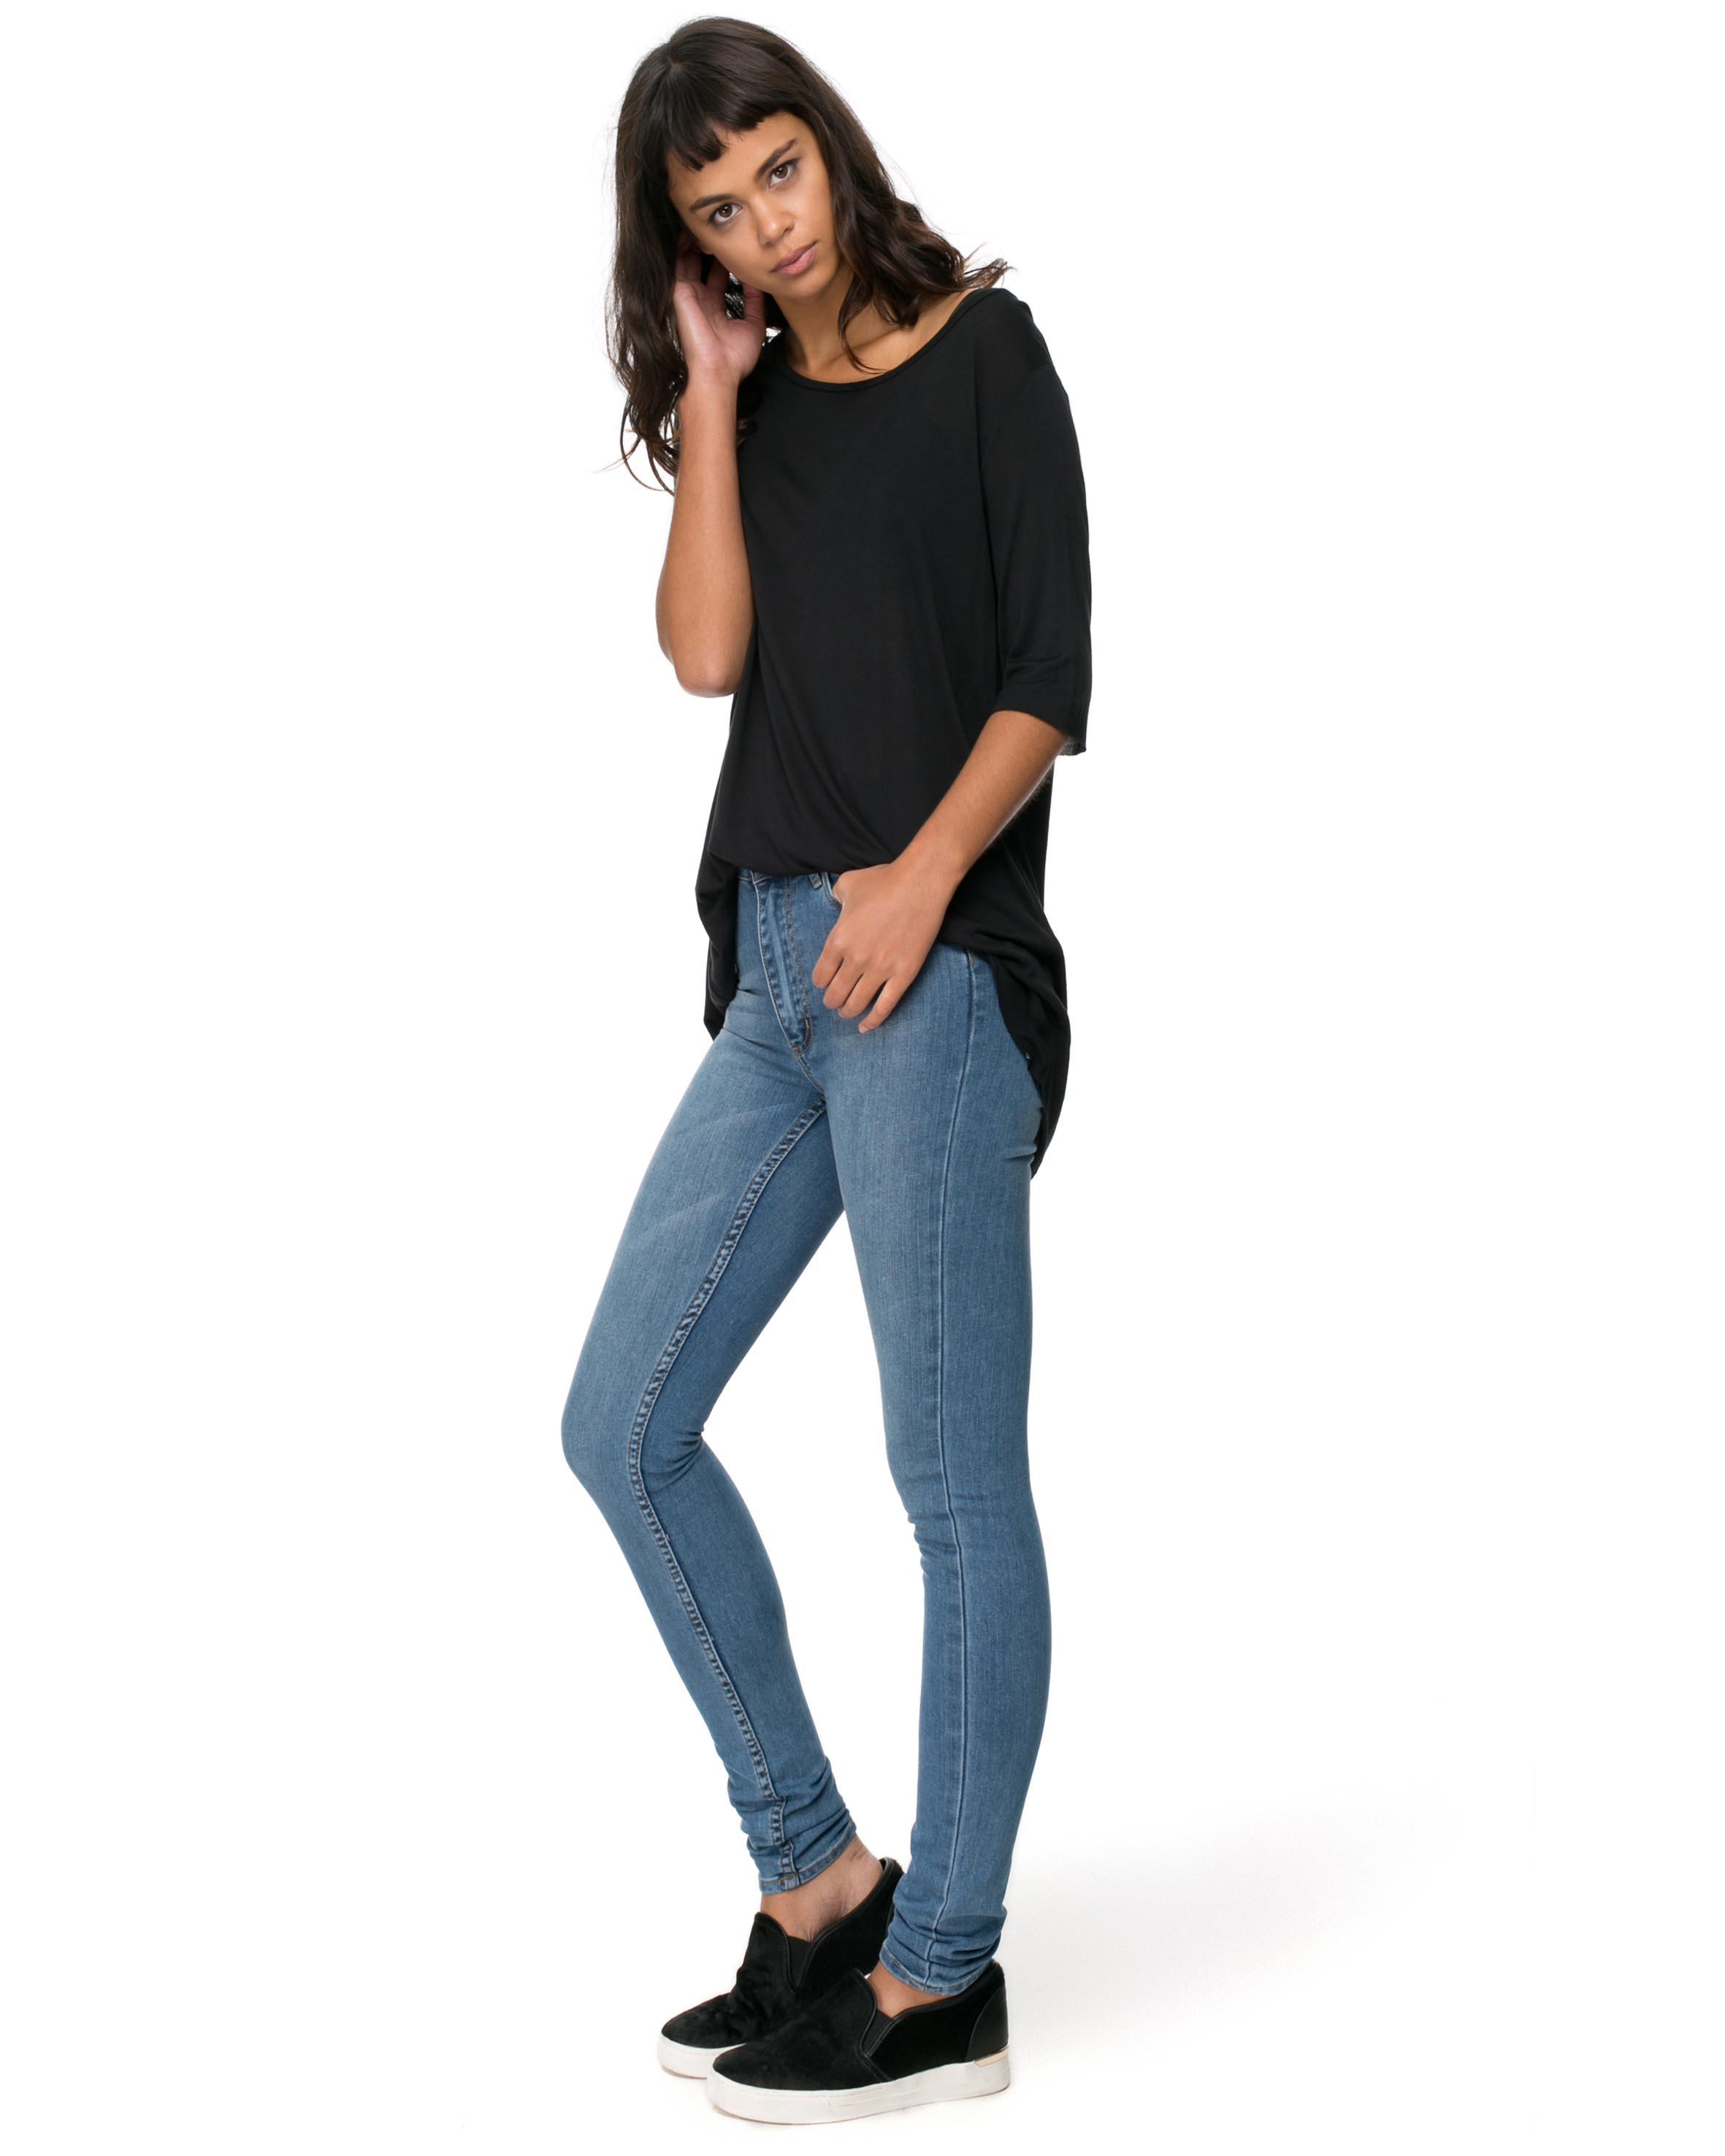 Womens Clothing Online | Unique Womens Fashion at Joe Browns